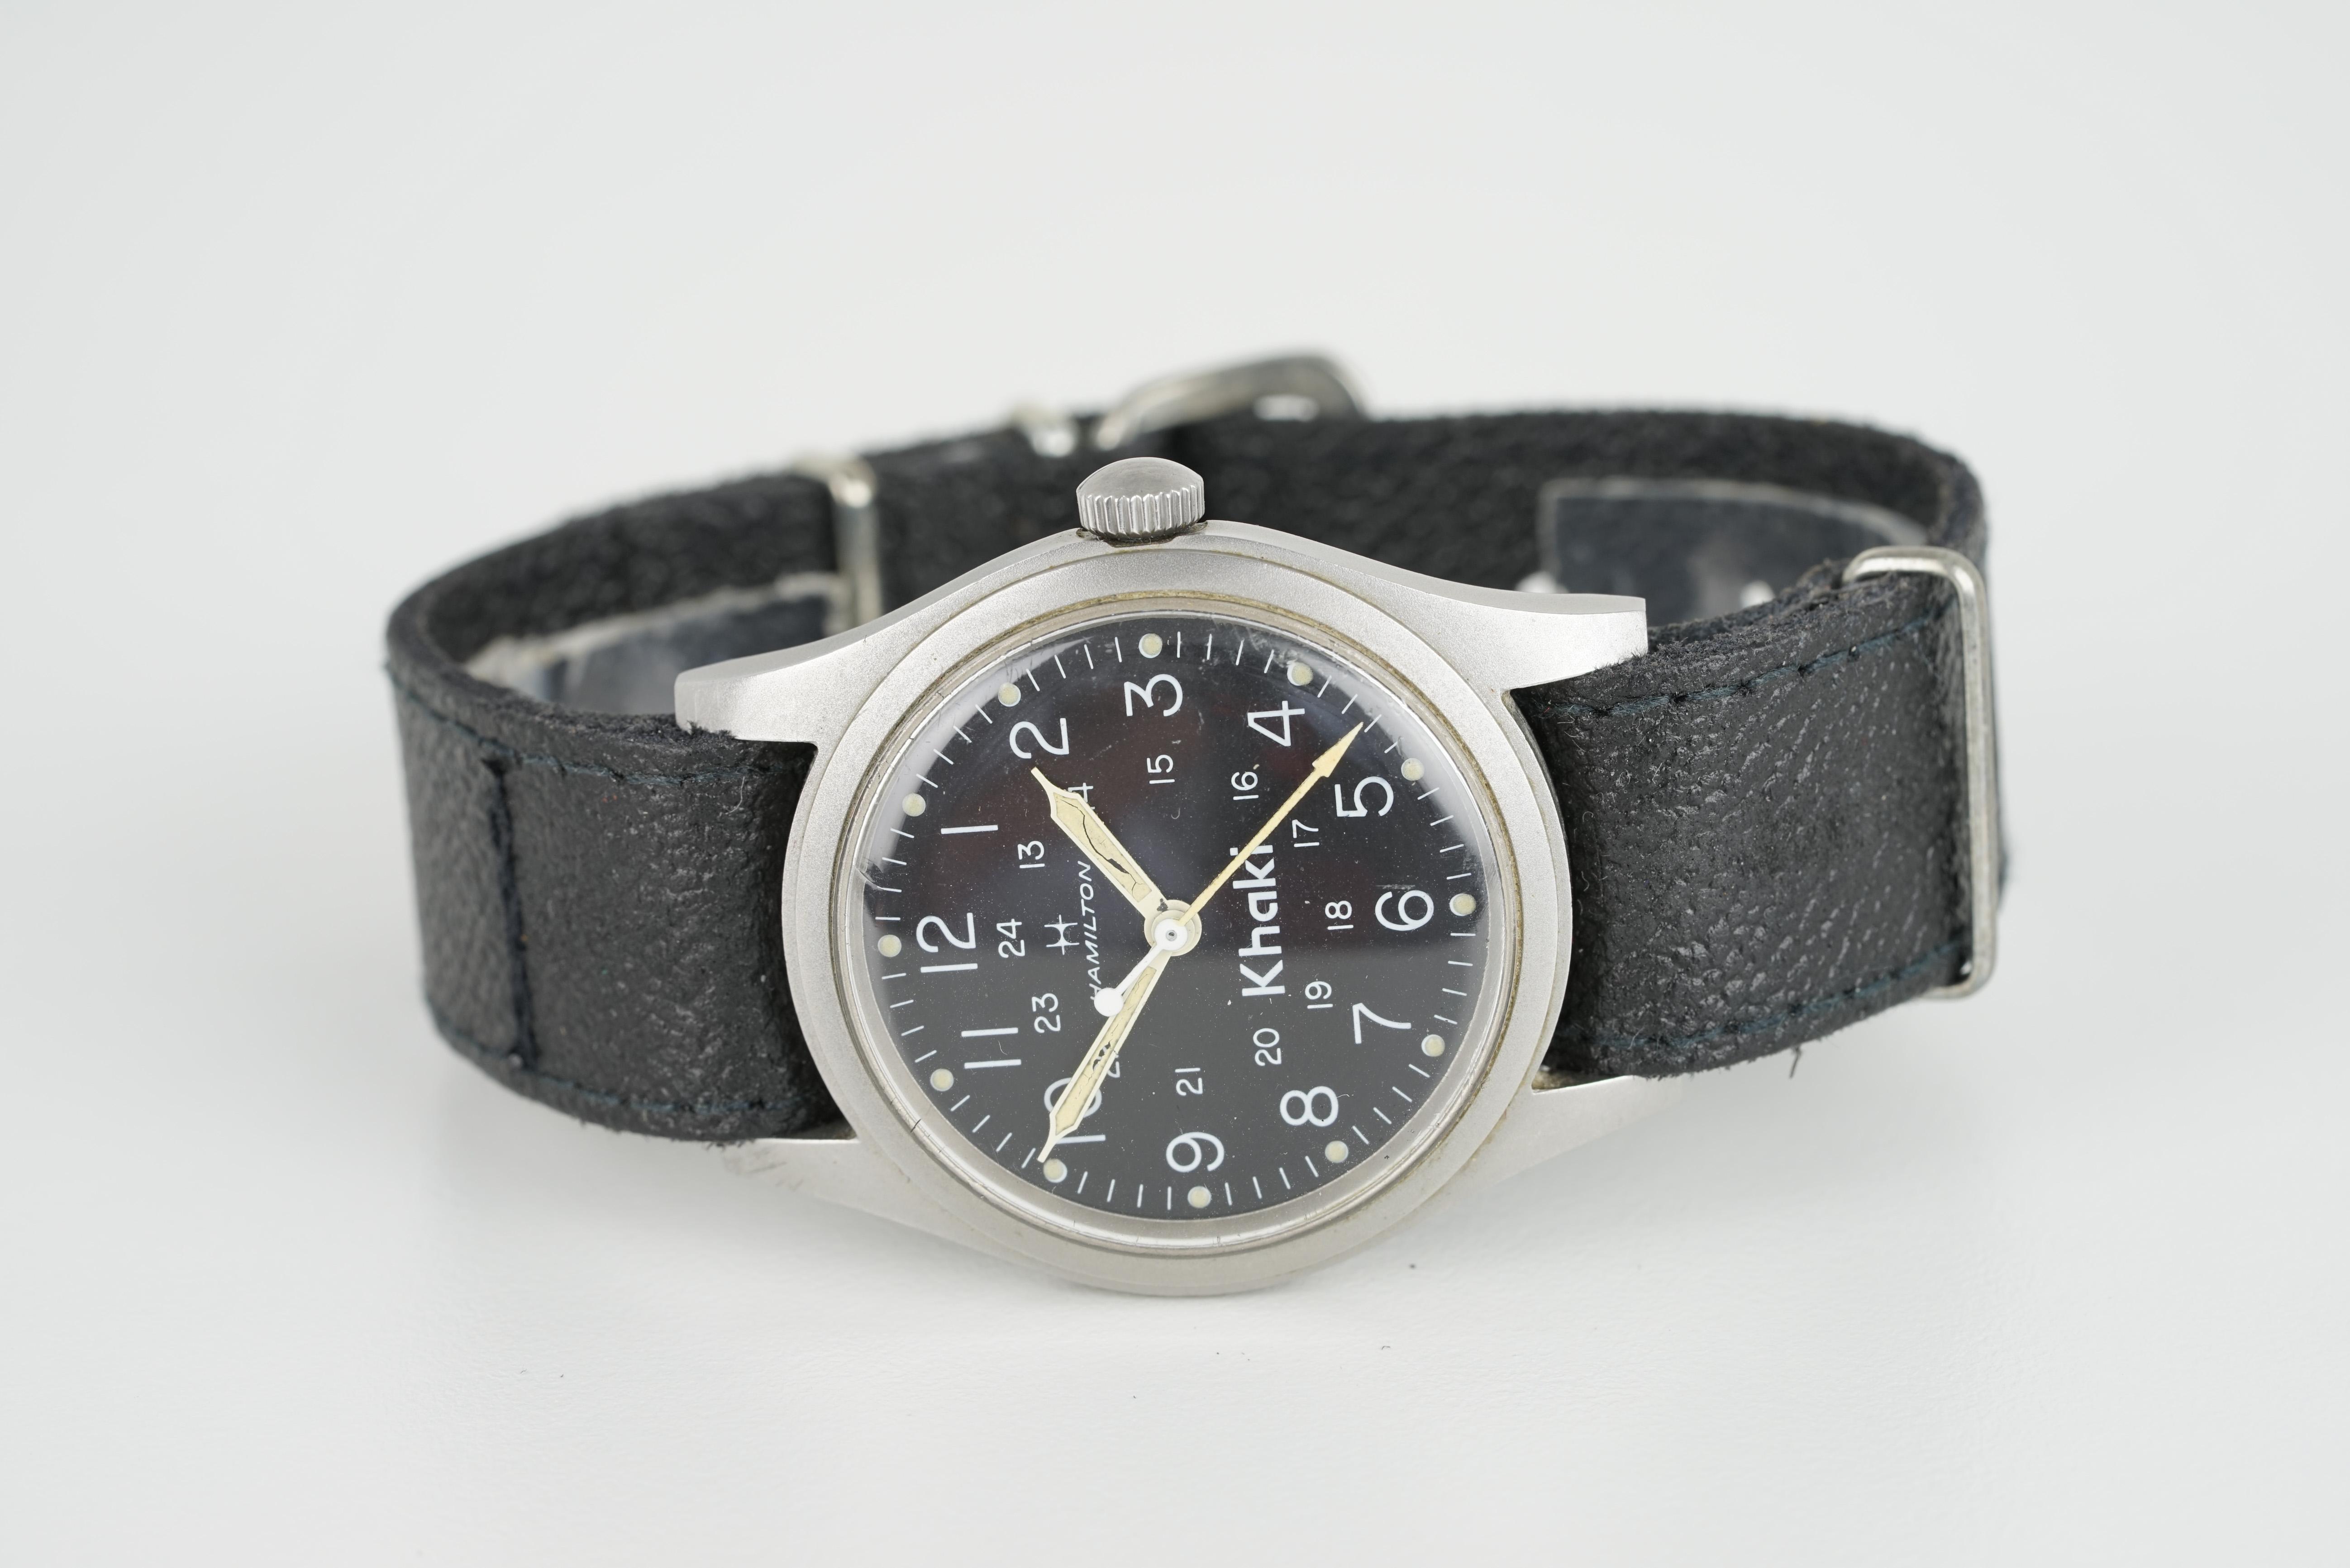 GENTLEMENS HAMILTON KHAKI WRISTWATCH CIRCA 1970S, circular black dial with arabic numeral hour